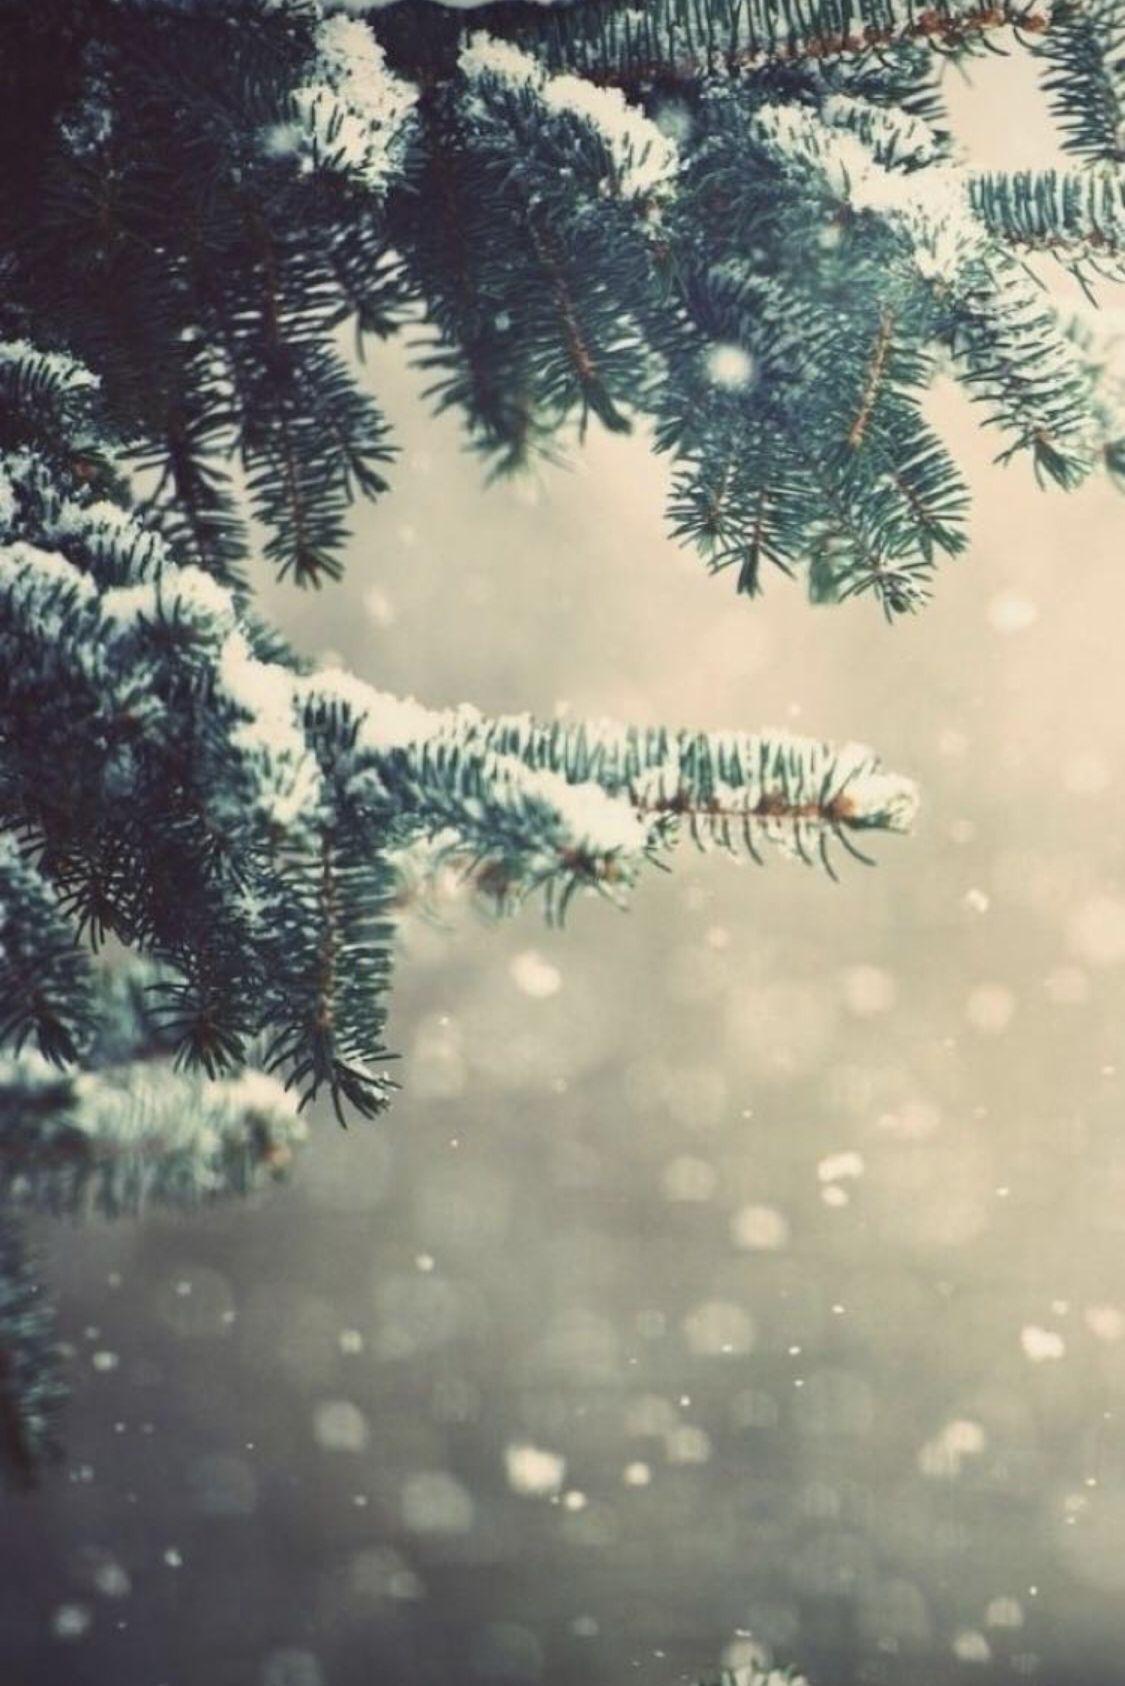 Follow @LittleMissPerfect for more ❤️ Insta: Lil.Loca.Lil #winterbackground